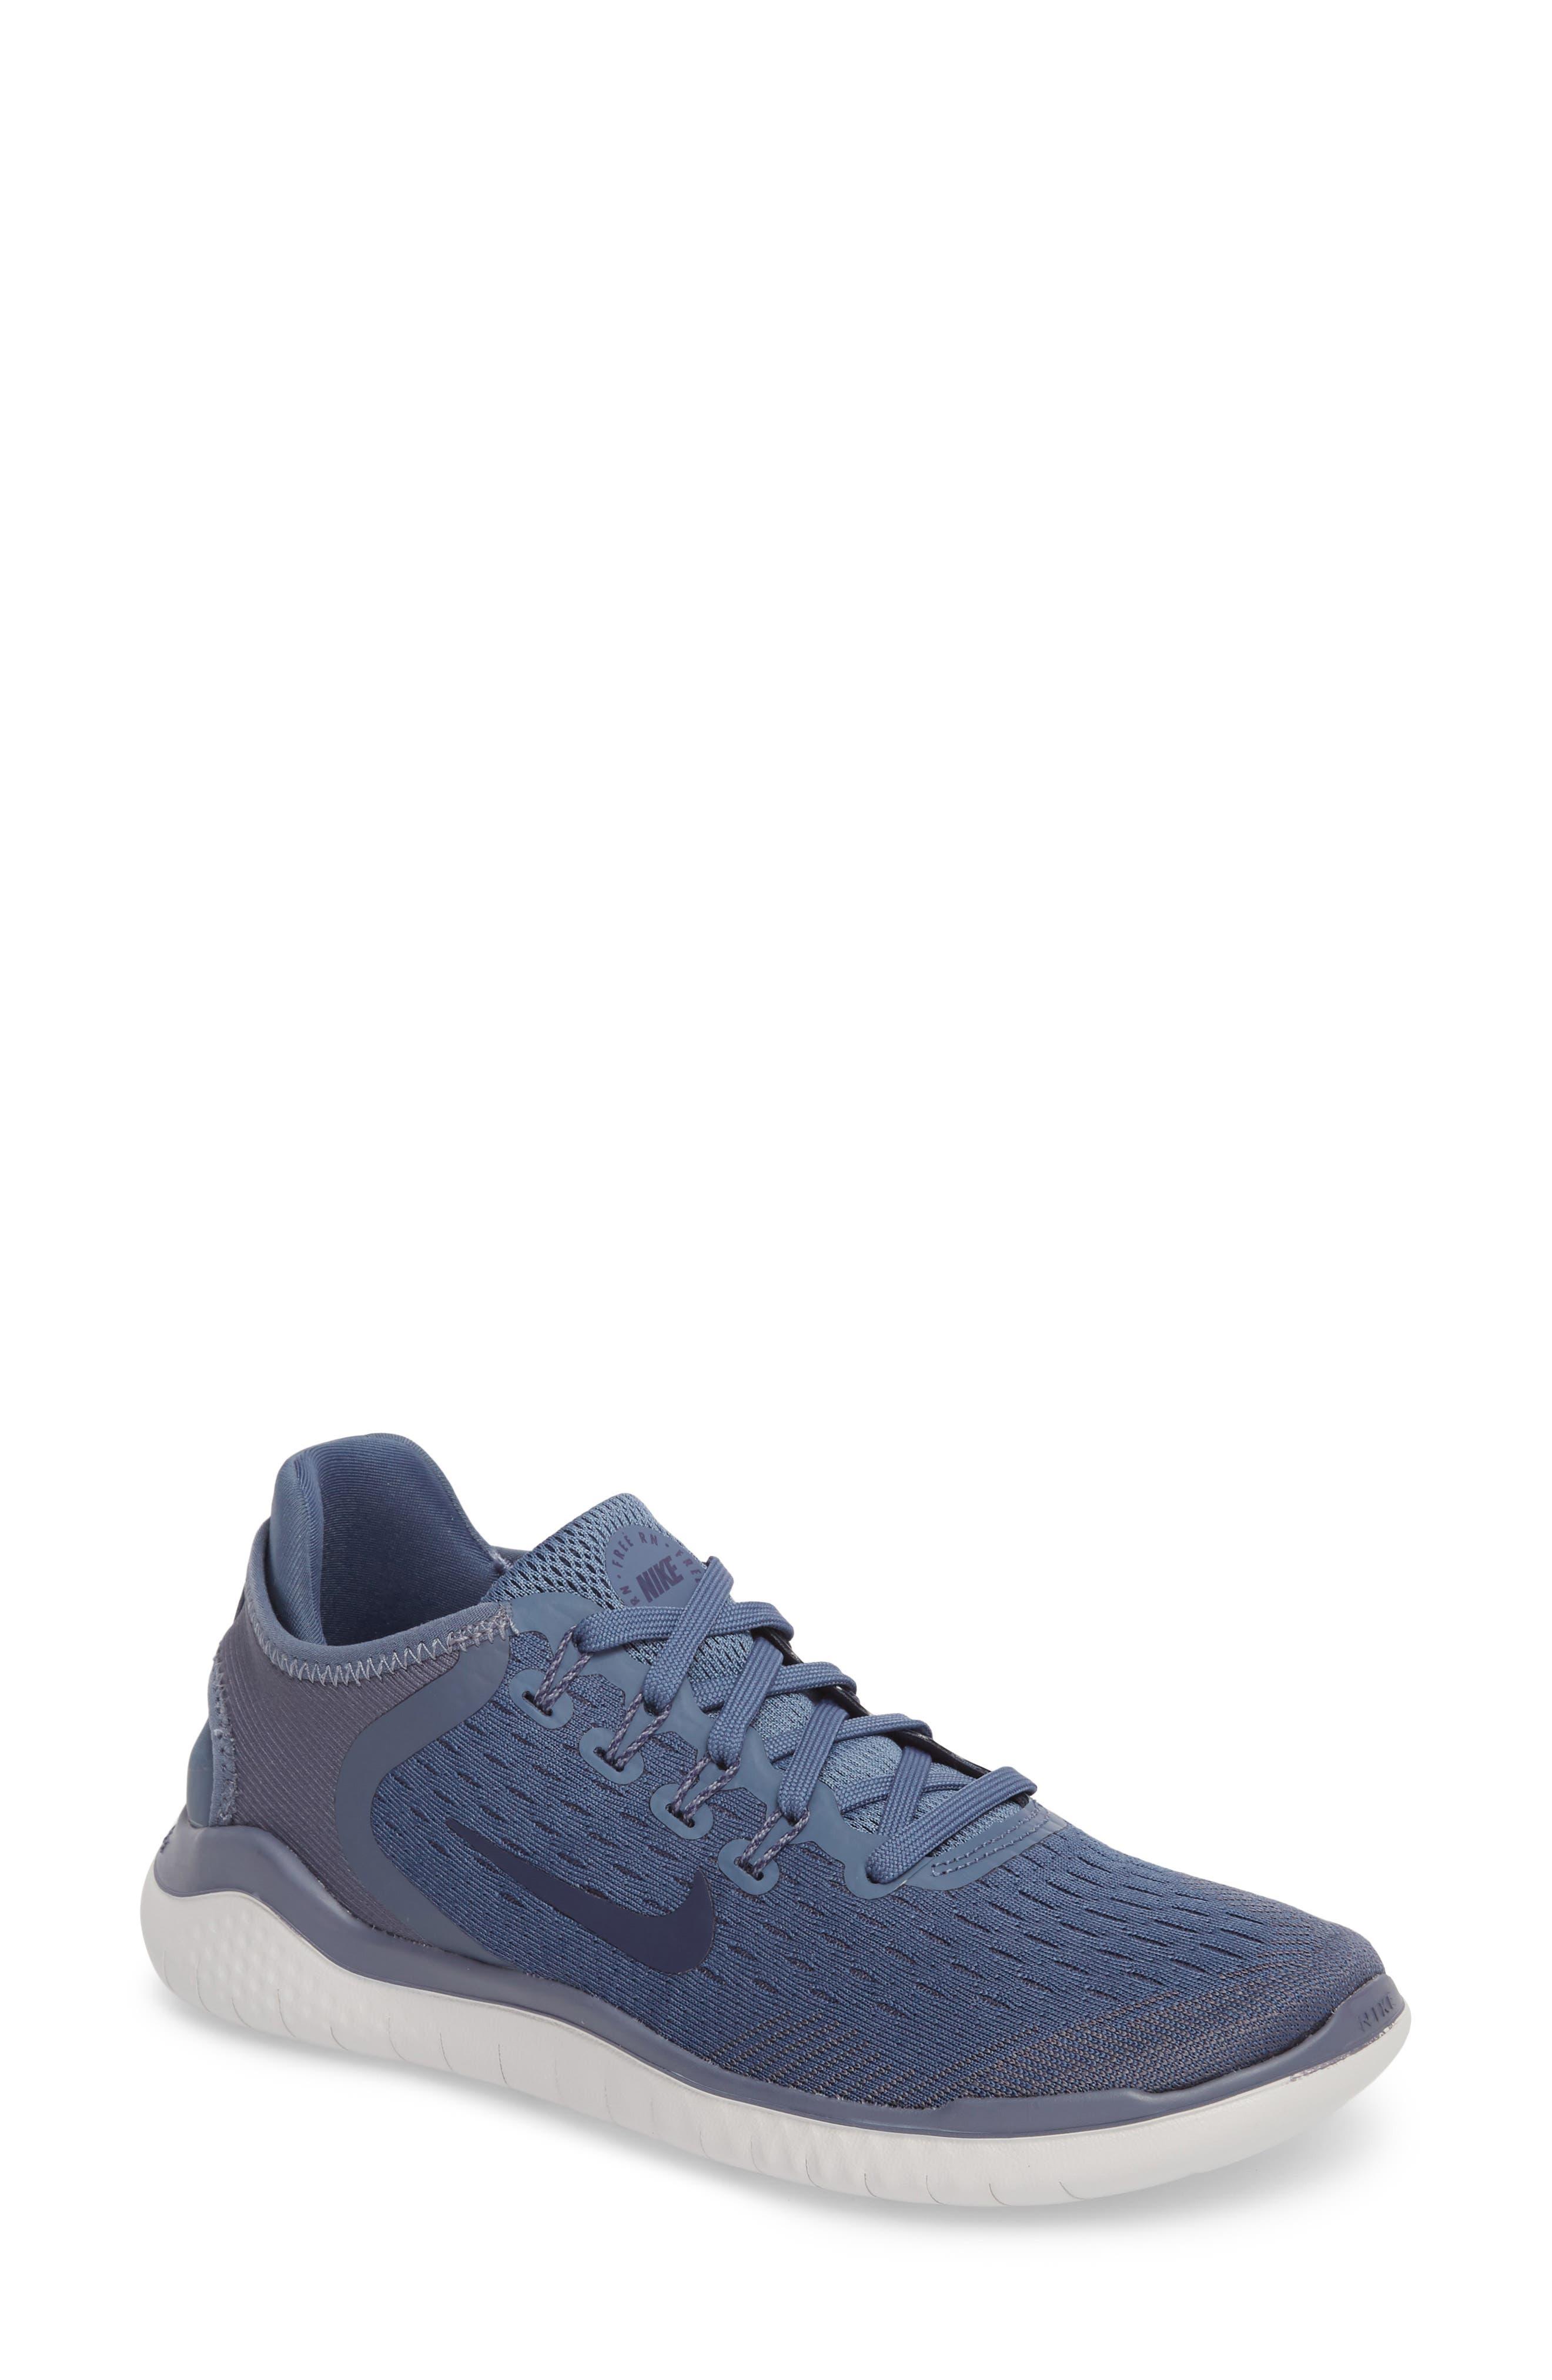 Free RN 2018 Running Shoe,                             Main thumbnail 1, color,                             Diffused Blue/ Neutral Indigo